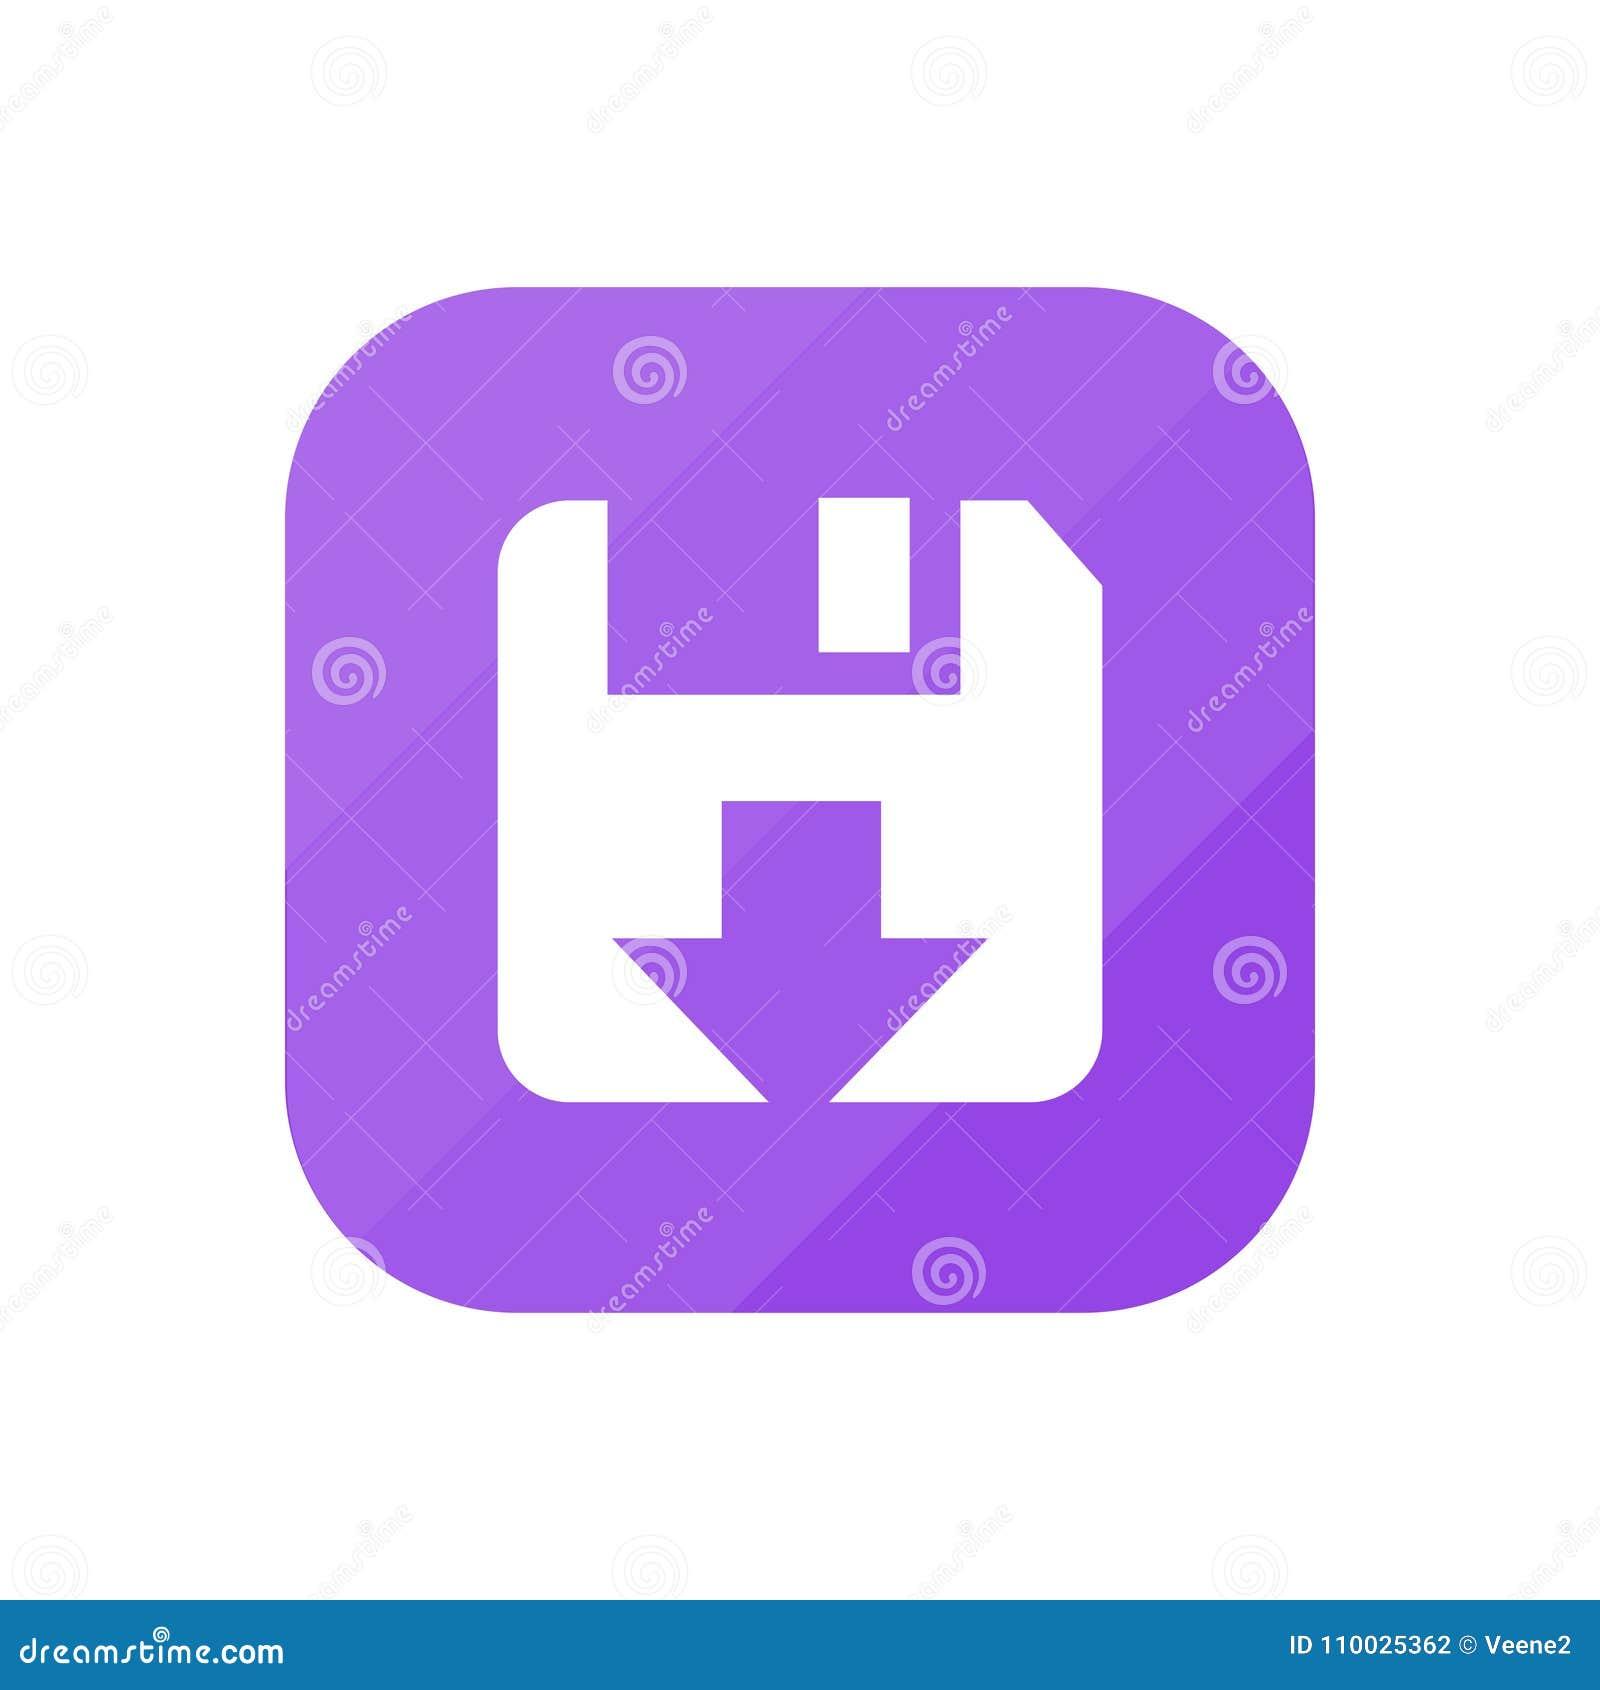 Download - App Pictogram